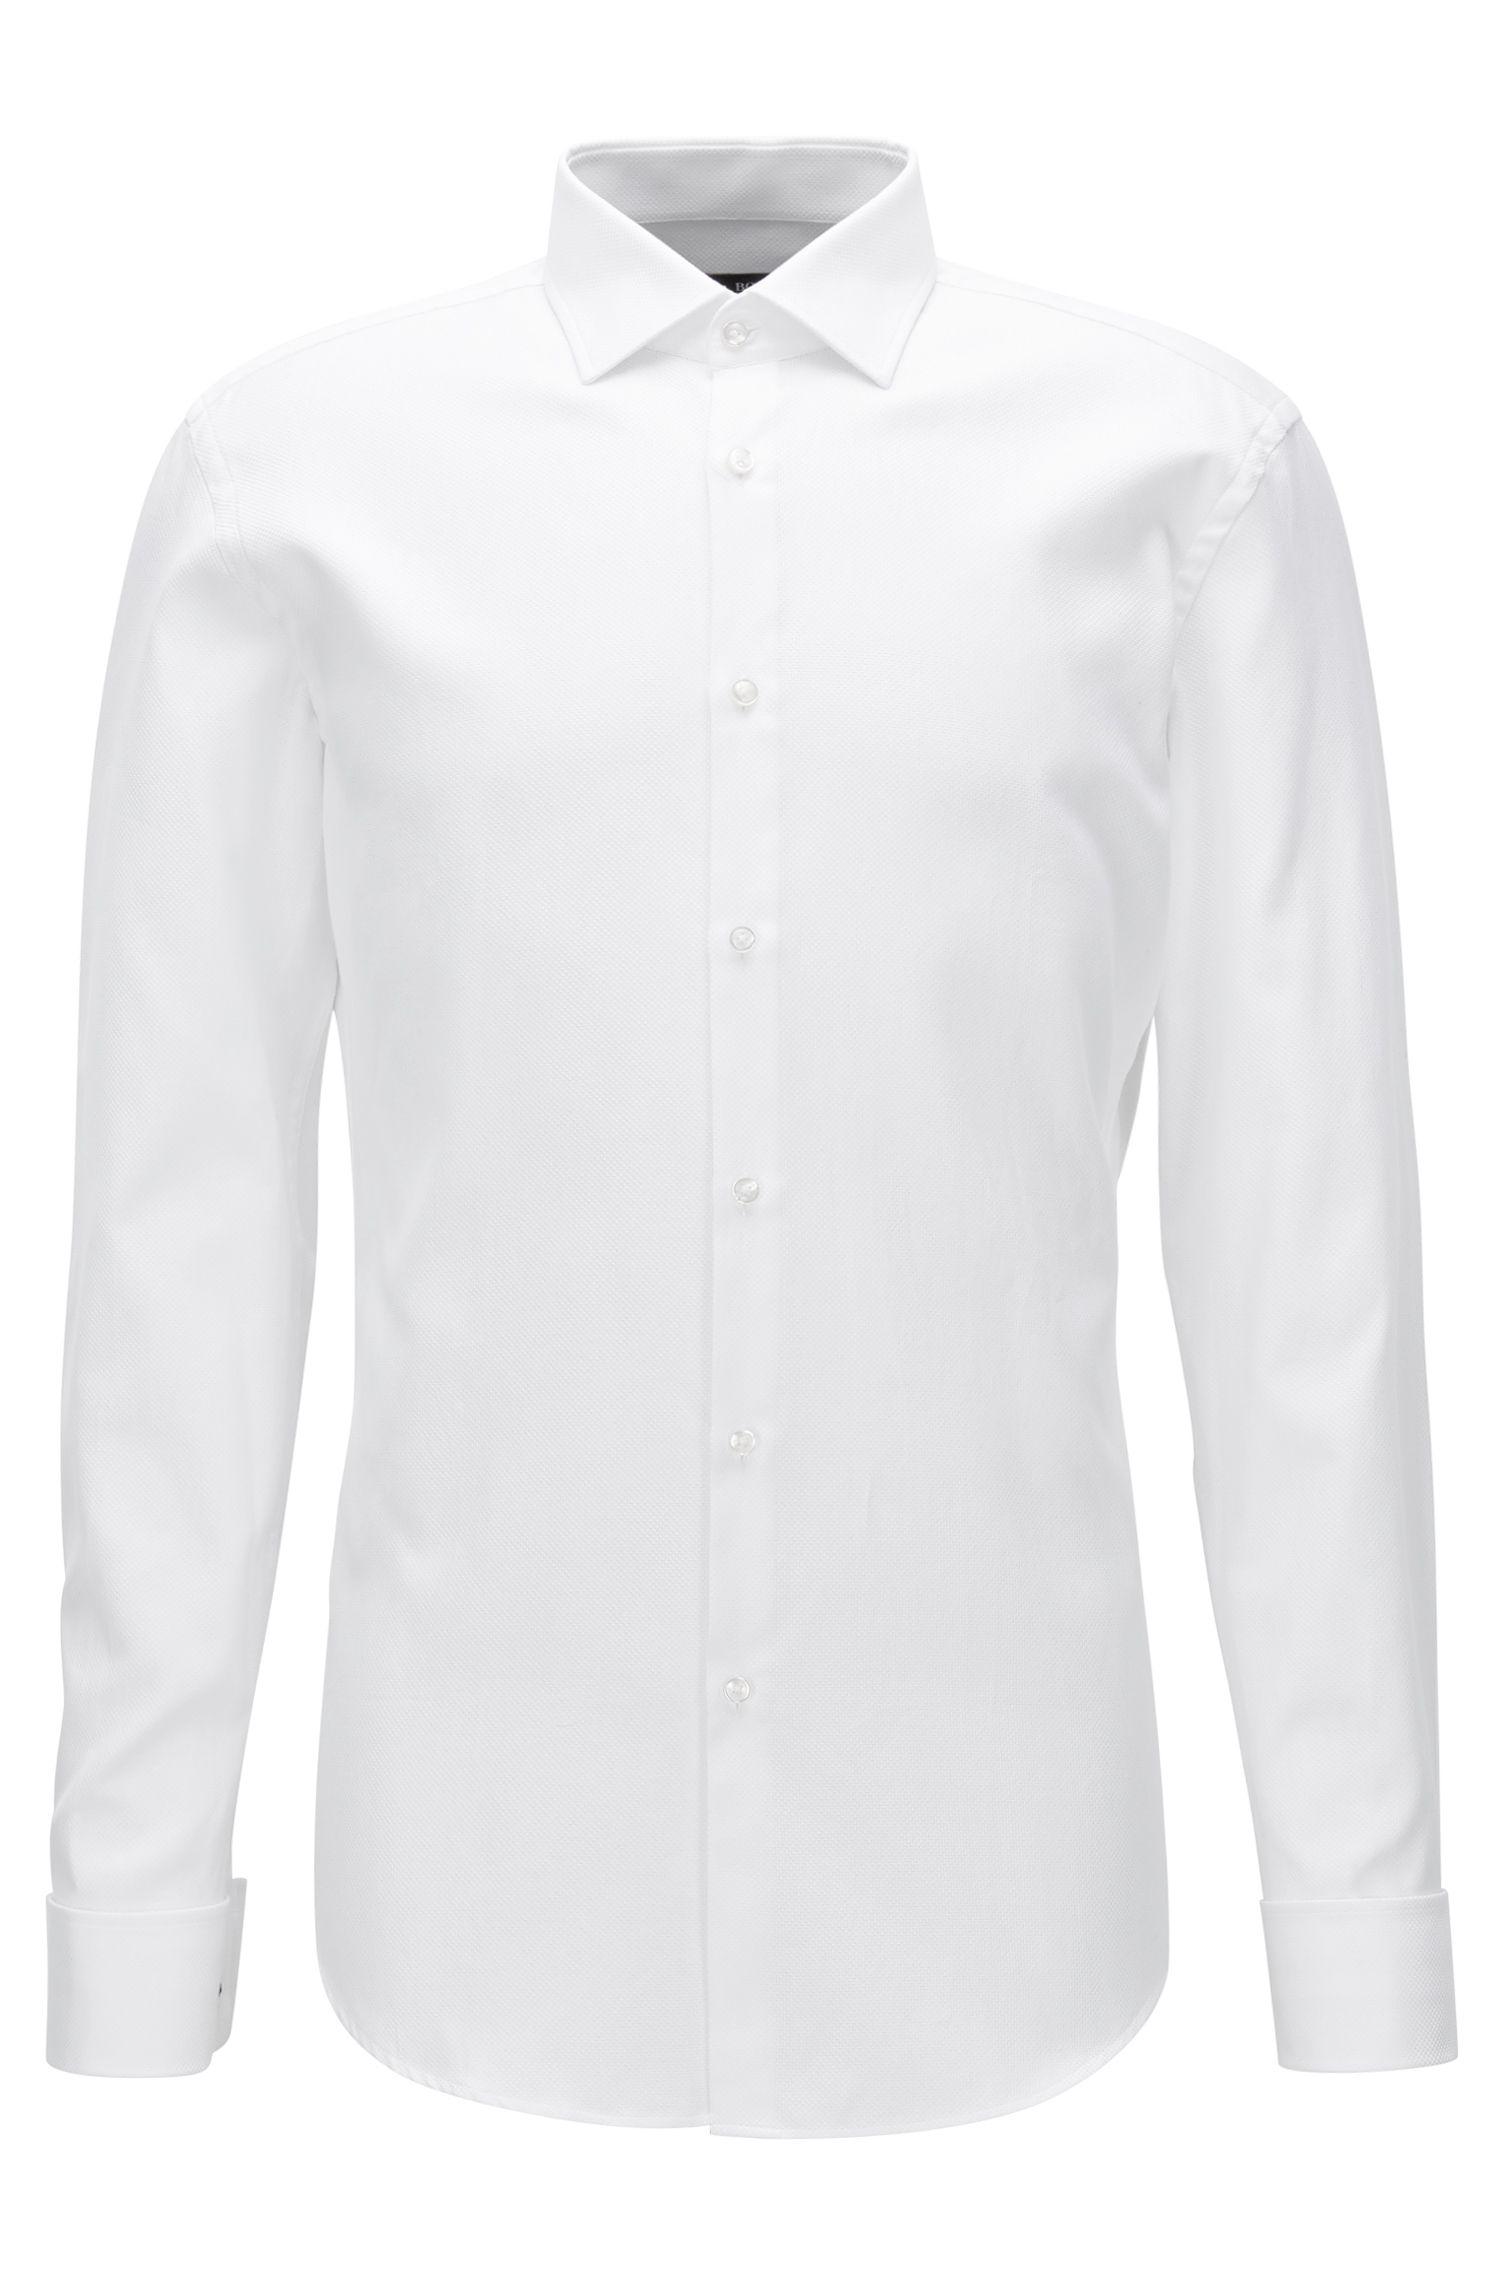 Geometric French Cuff Cotton Dress Shirt, Slim Fit | Jacques